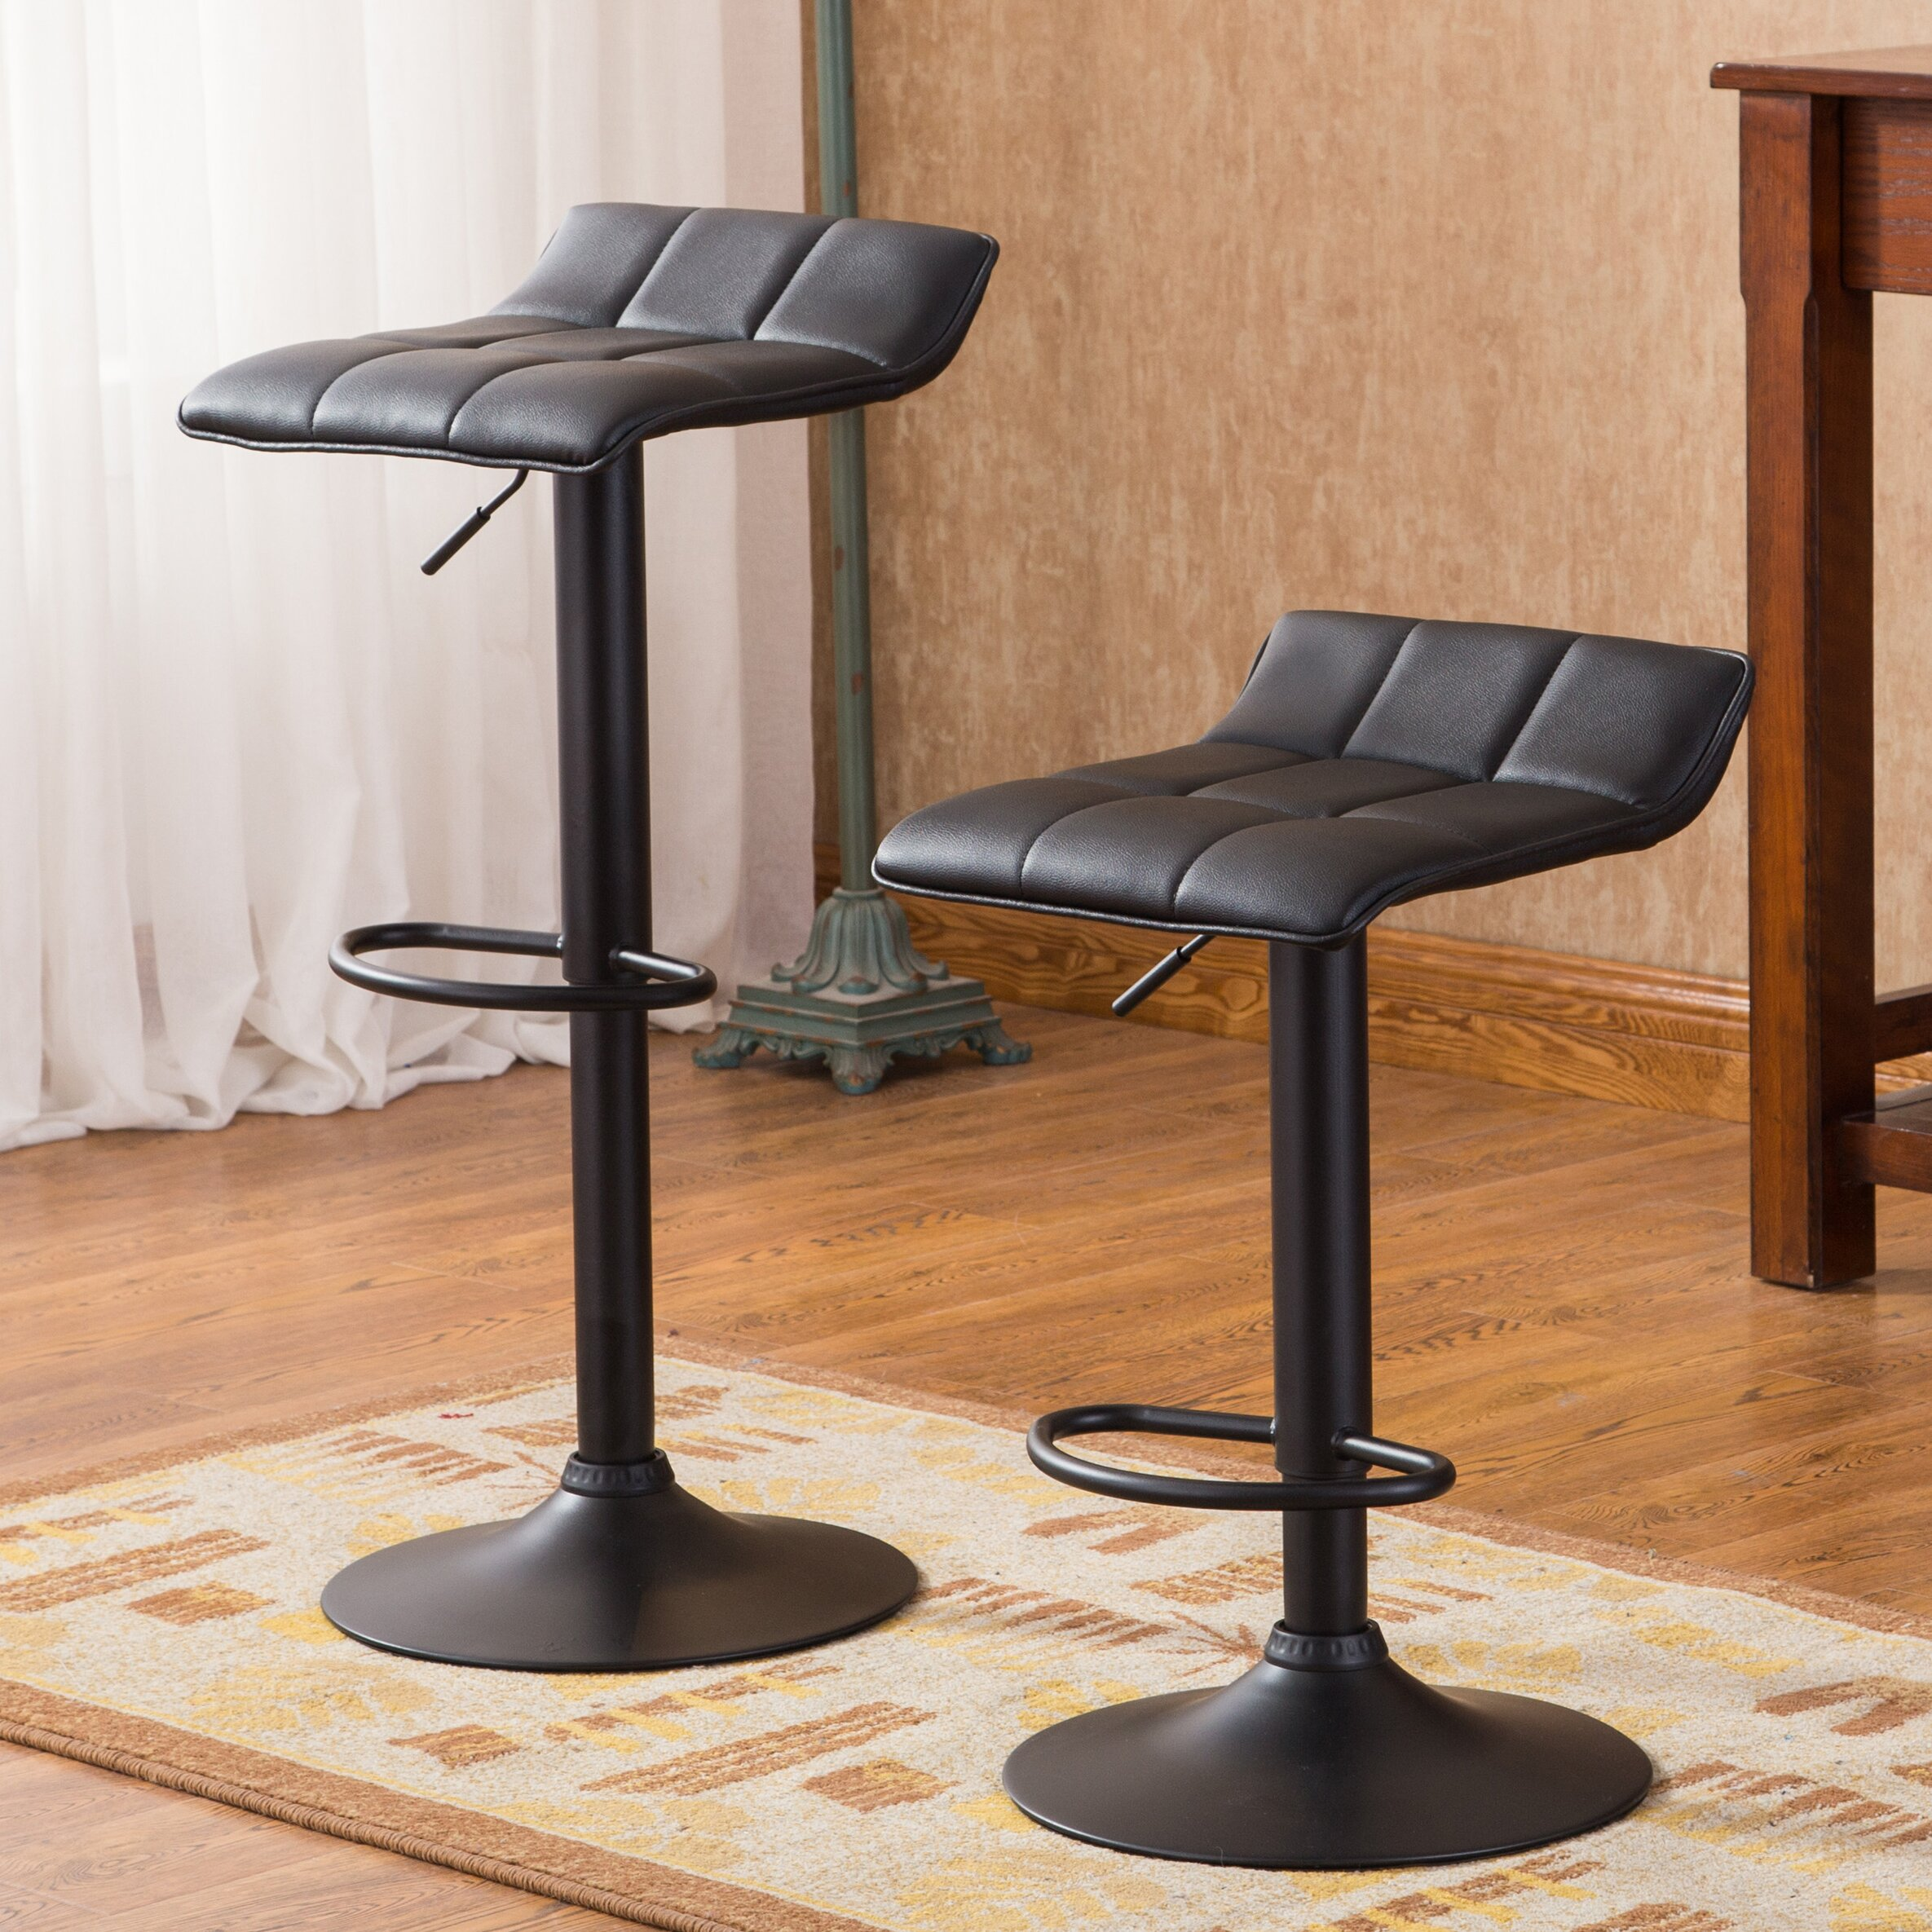 Brilliant Roundhill Furniture Bar Stools 51 Off Roundhill Furniture Theyellowbook Wood Chair Design Ideas Theyellowbookinfo